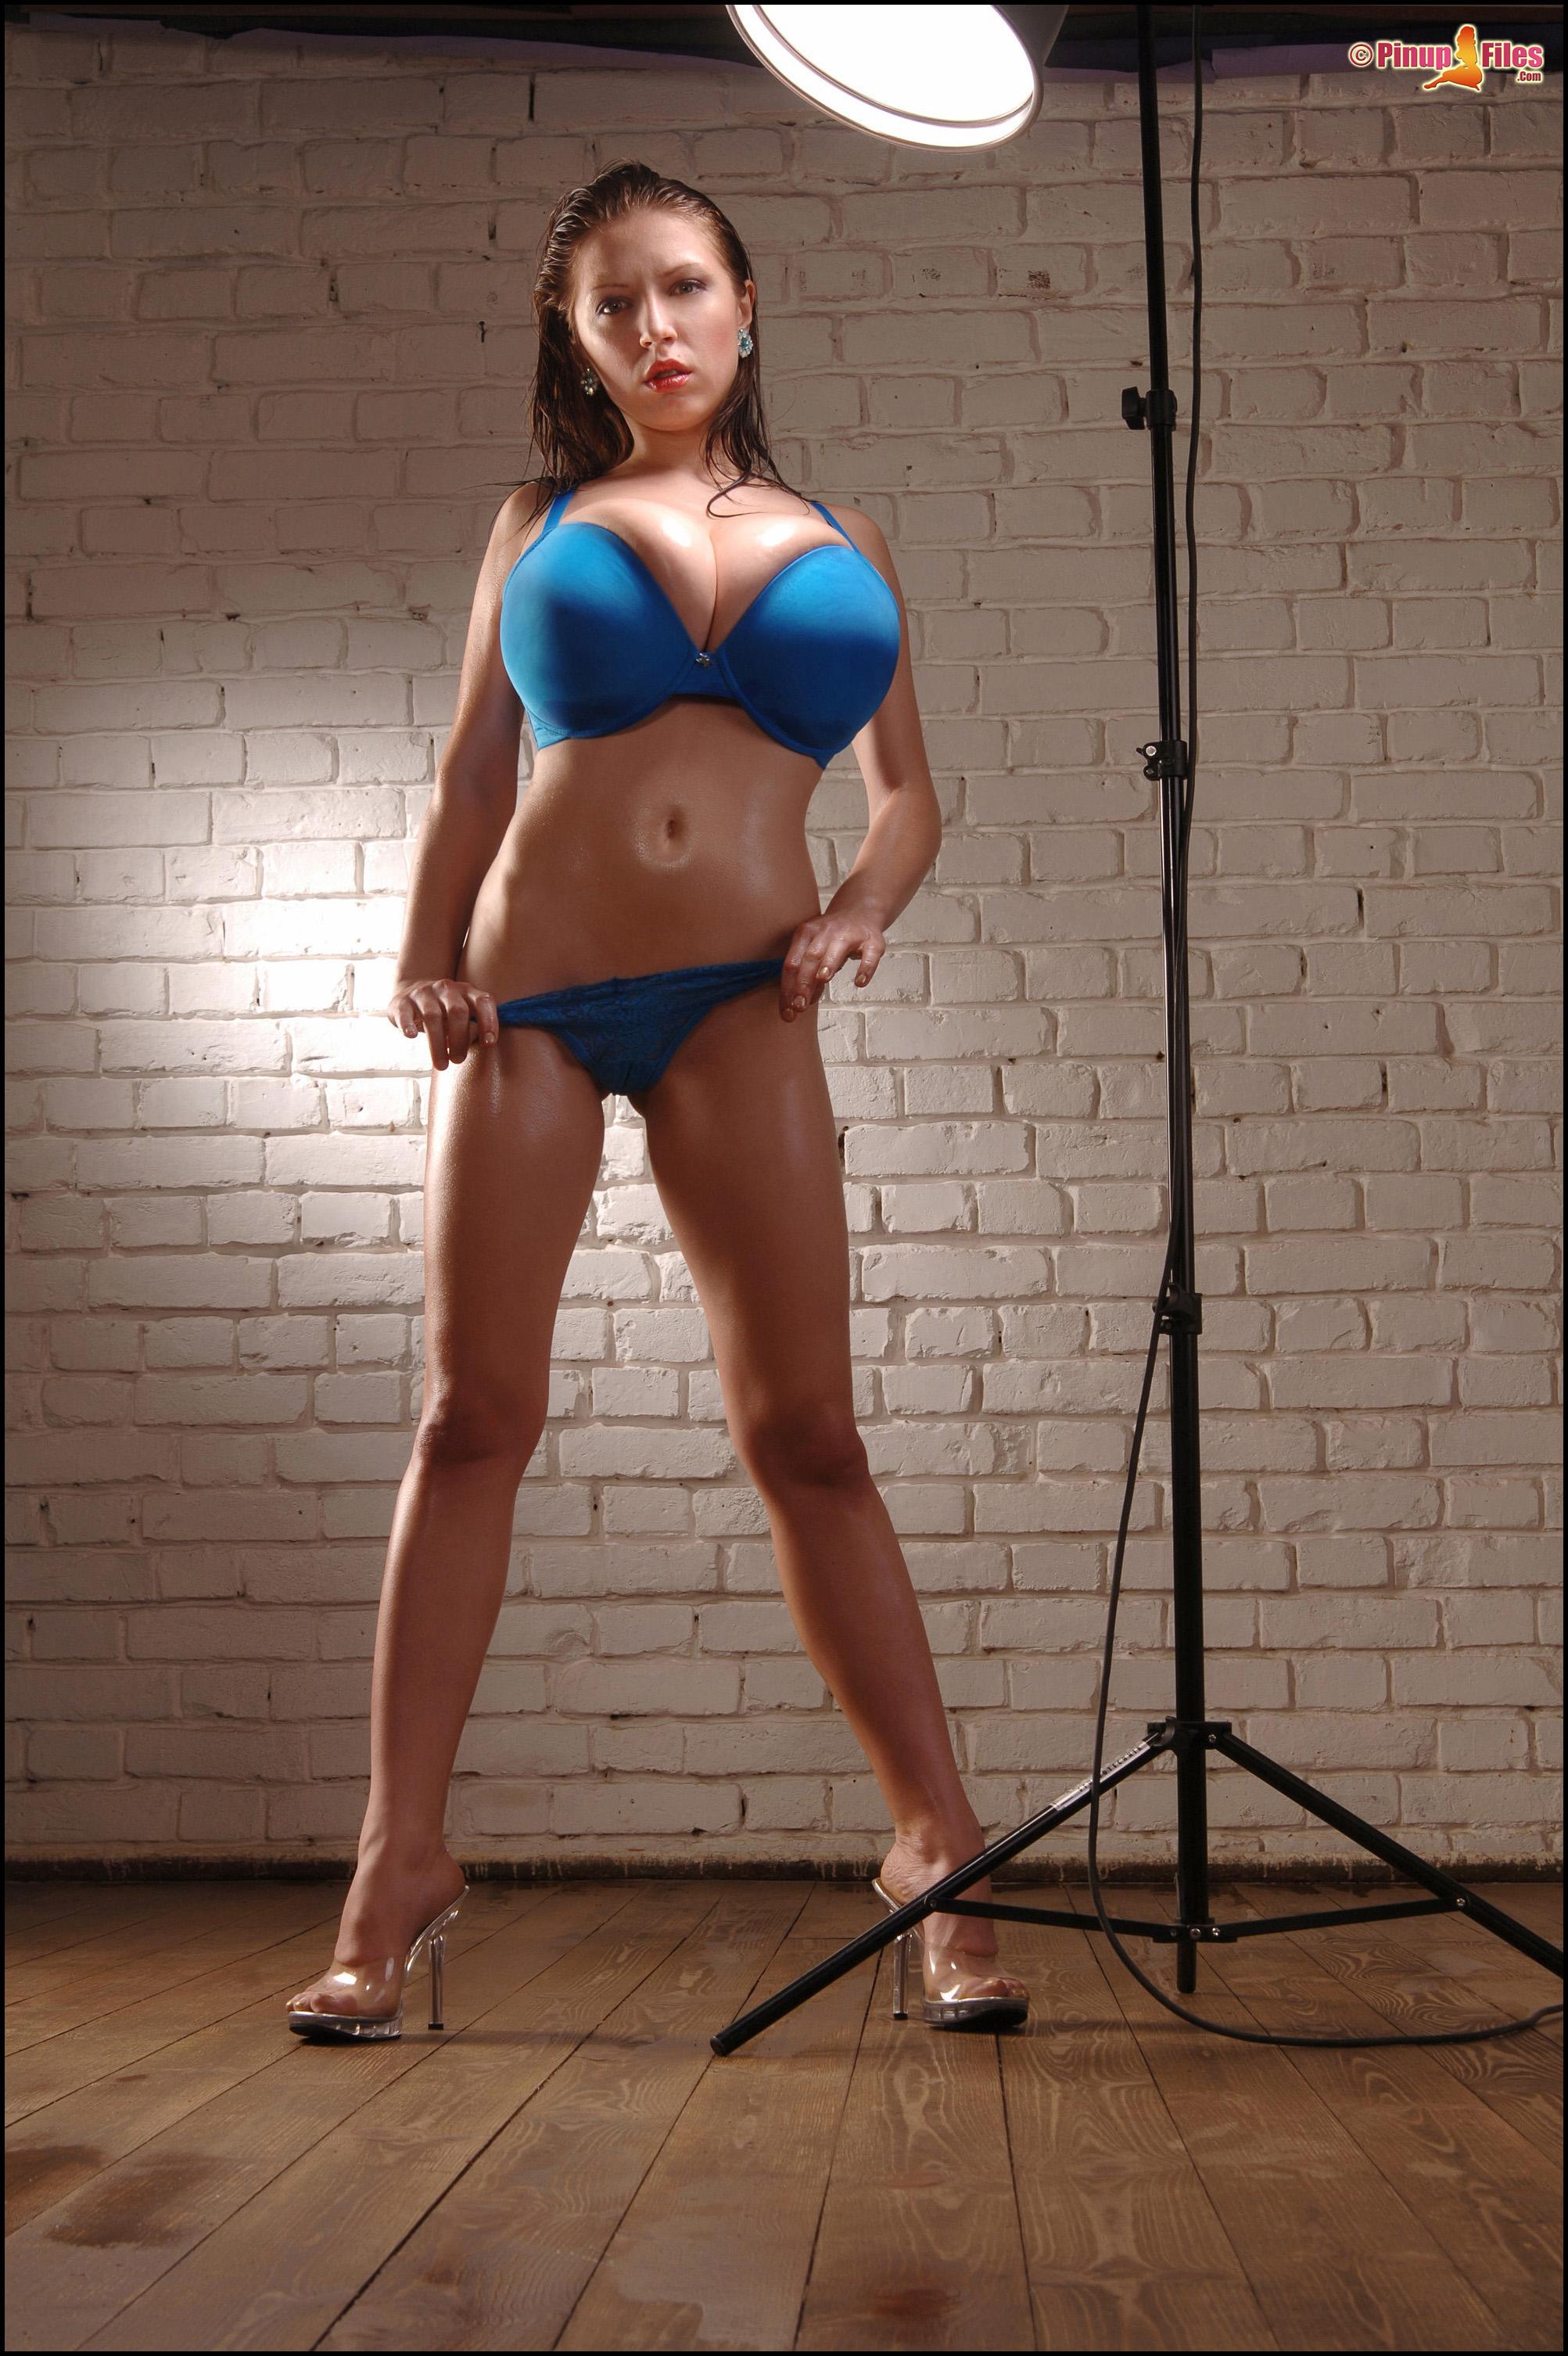 http://promo.pinupfiles.com/FHG/anyazenkova-vol10-set01/04.jpg